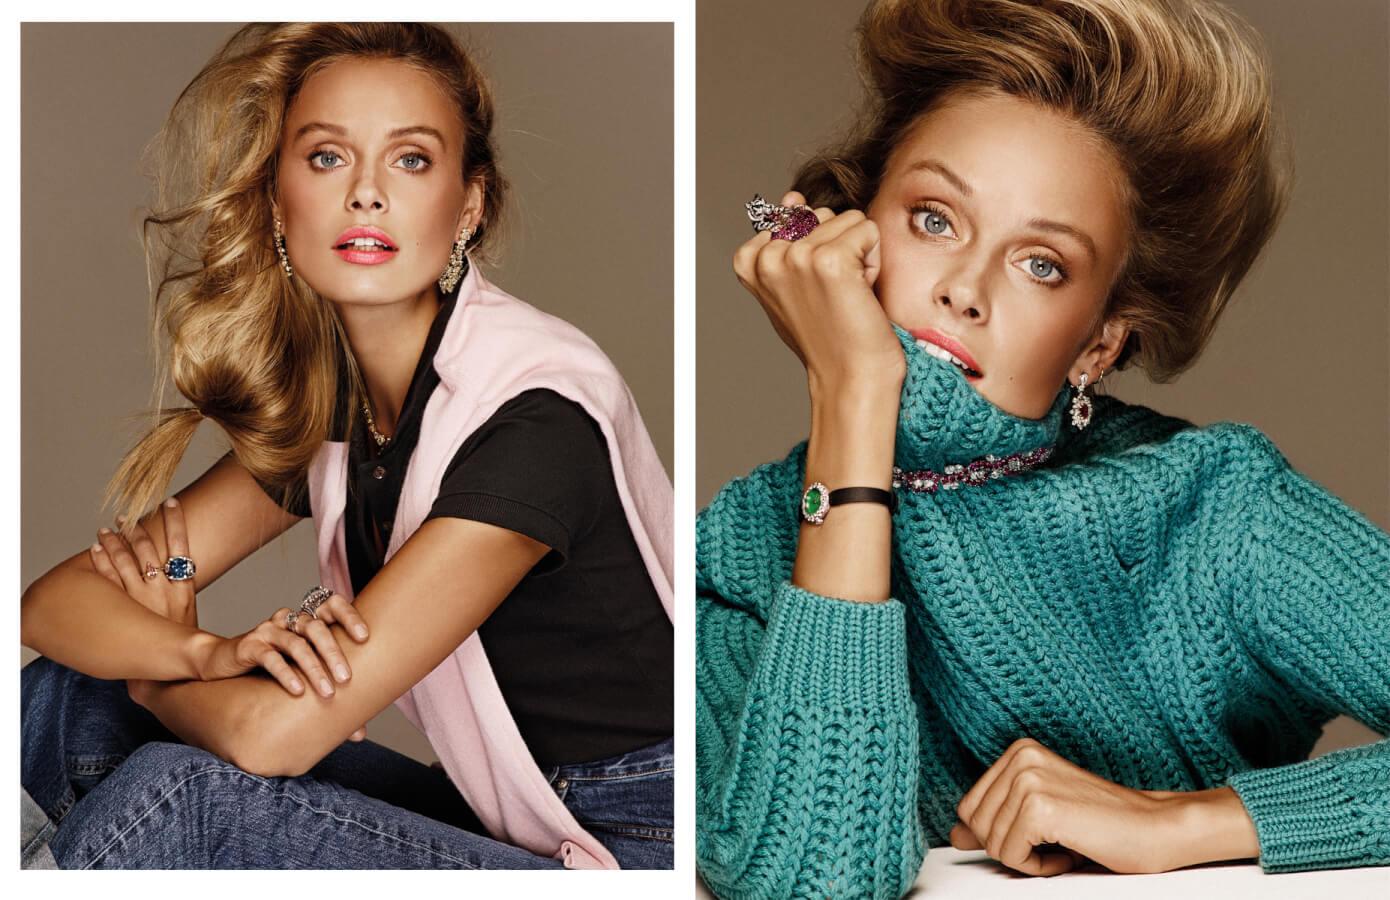 03_Alvaro_Beamud_Cortes_Vogue_Spain_Inguna_Butane